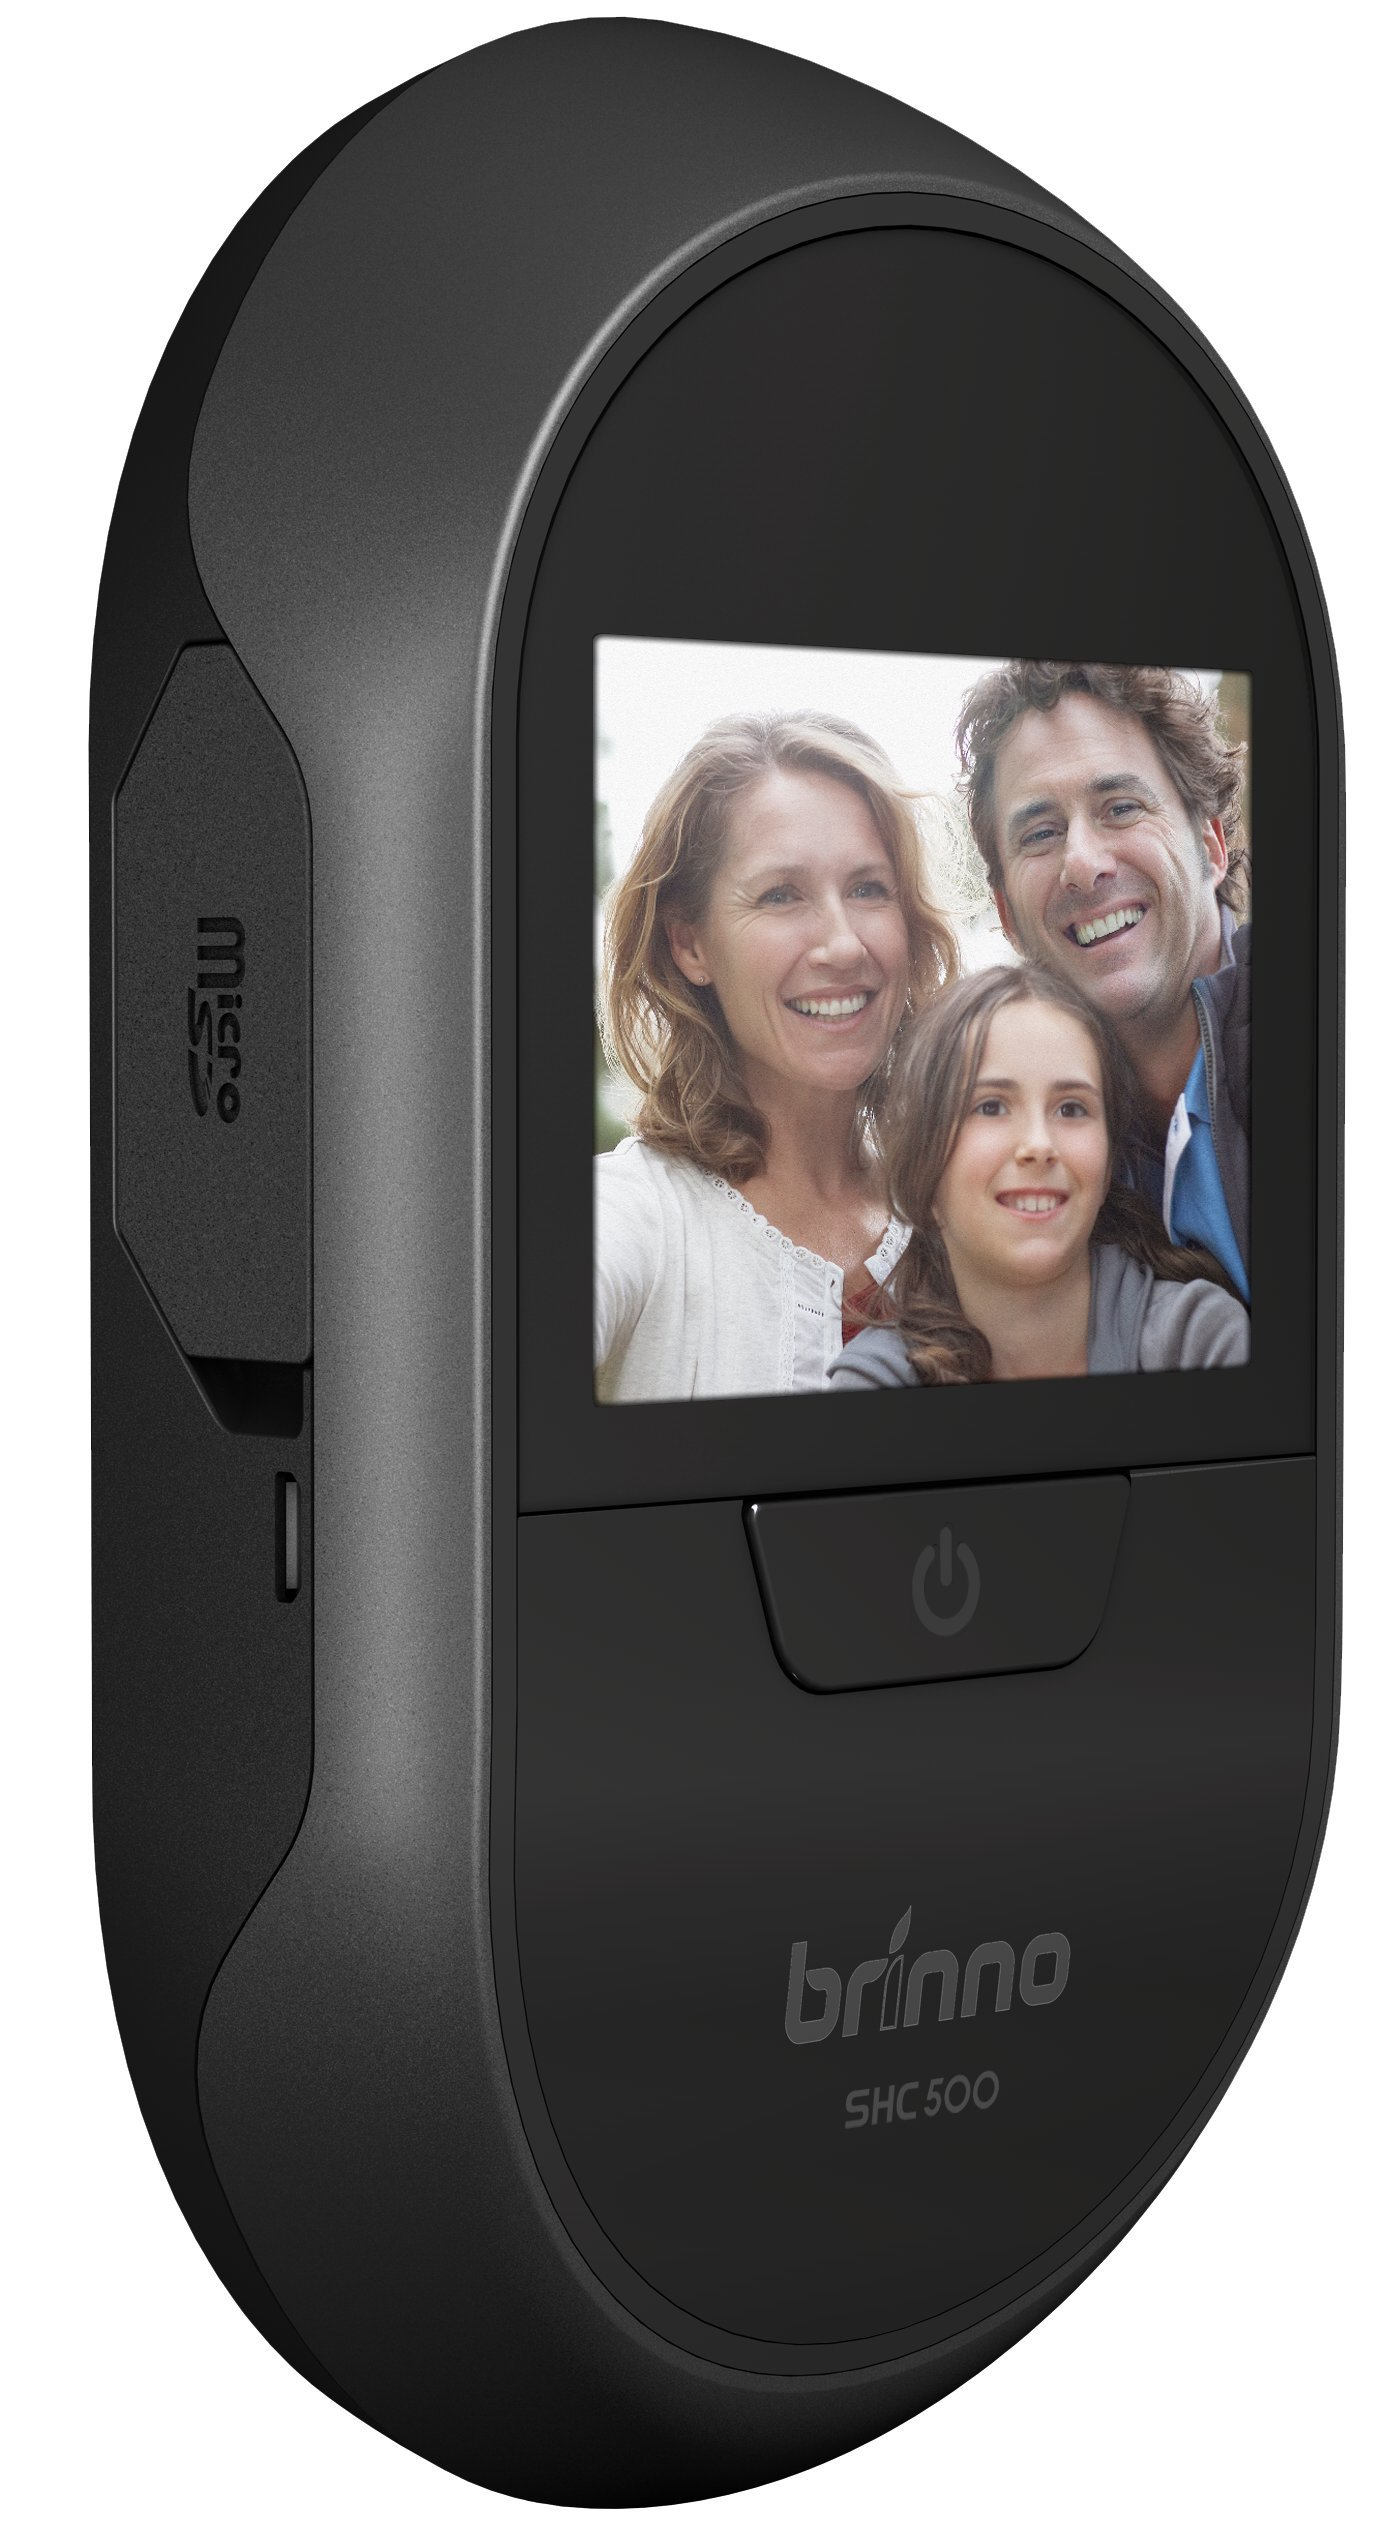 Brinno Front Door PeepHole Security Camera - Easy to Install - Theft Proof - Supieror Battery Life - No Smartphone Necessary- Black (SHC500)